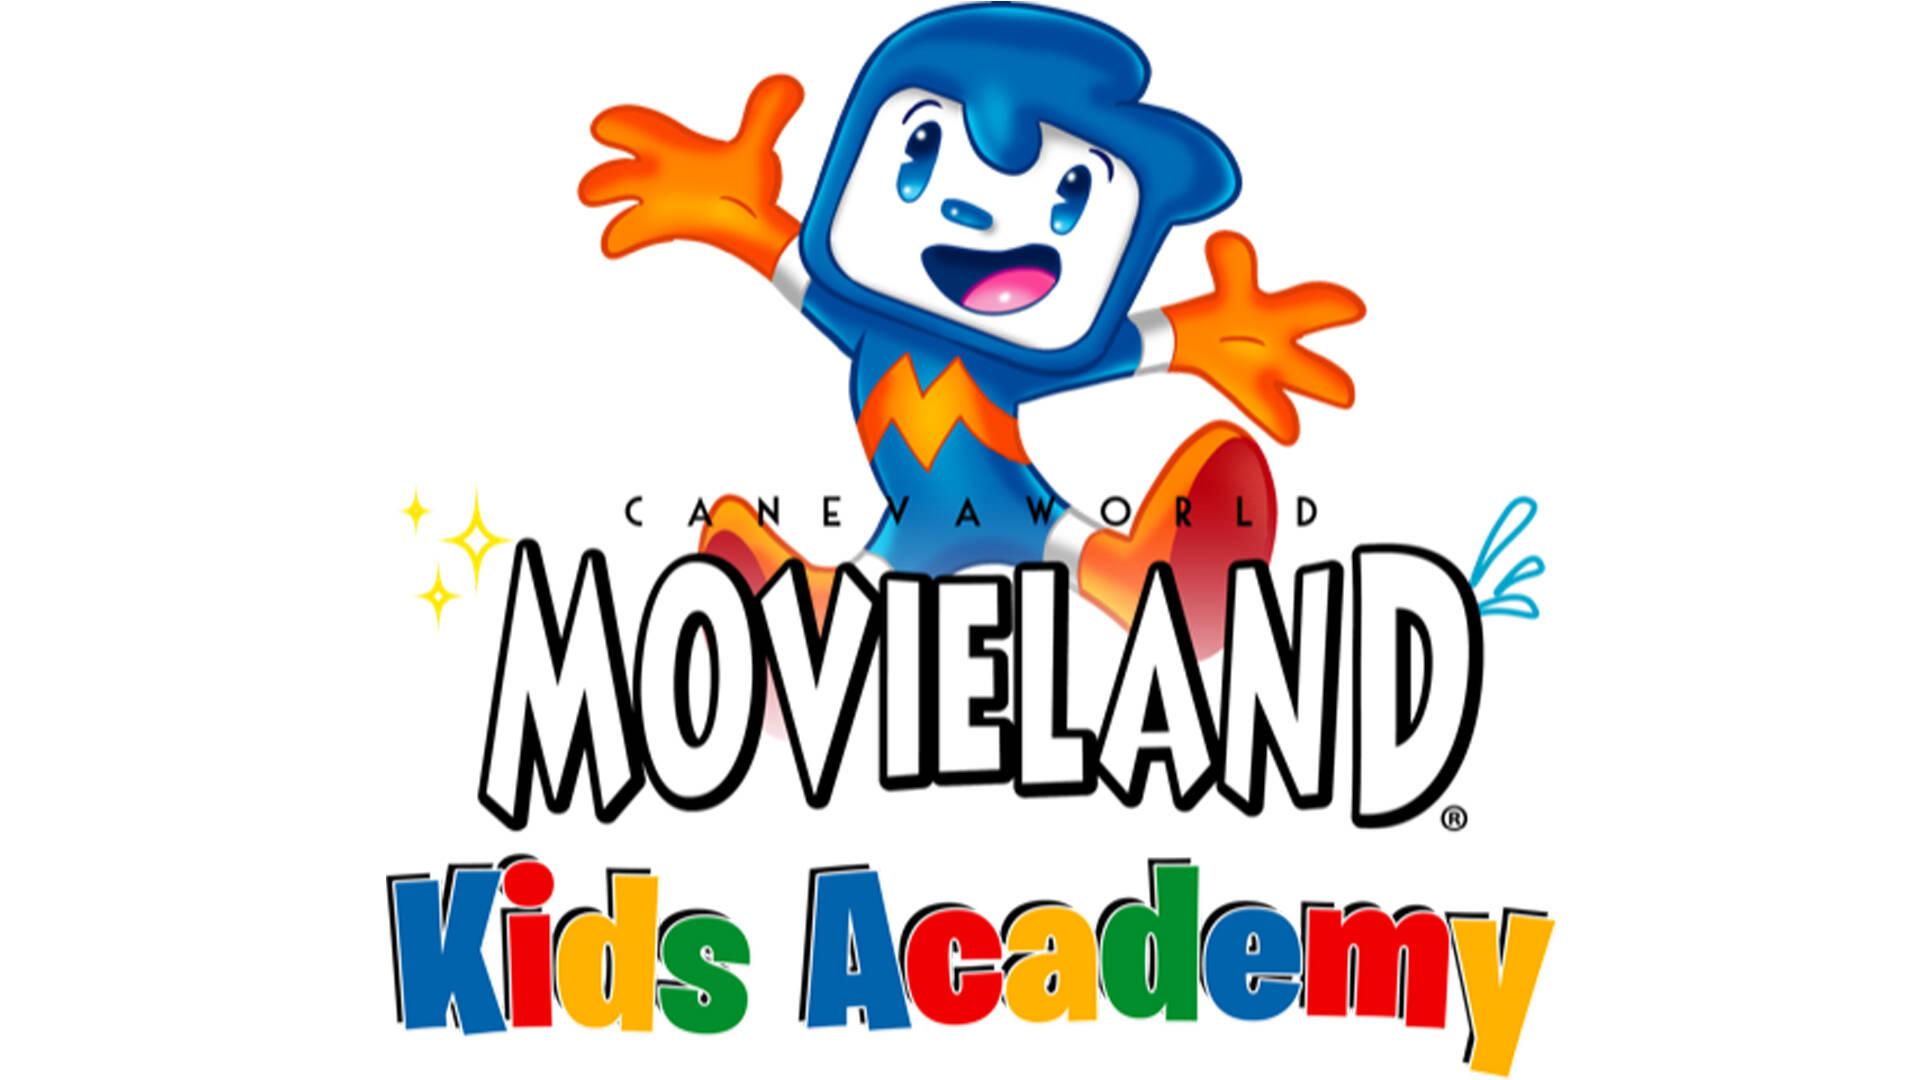 Movieland Kids Academy